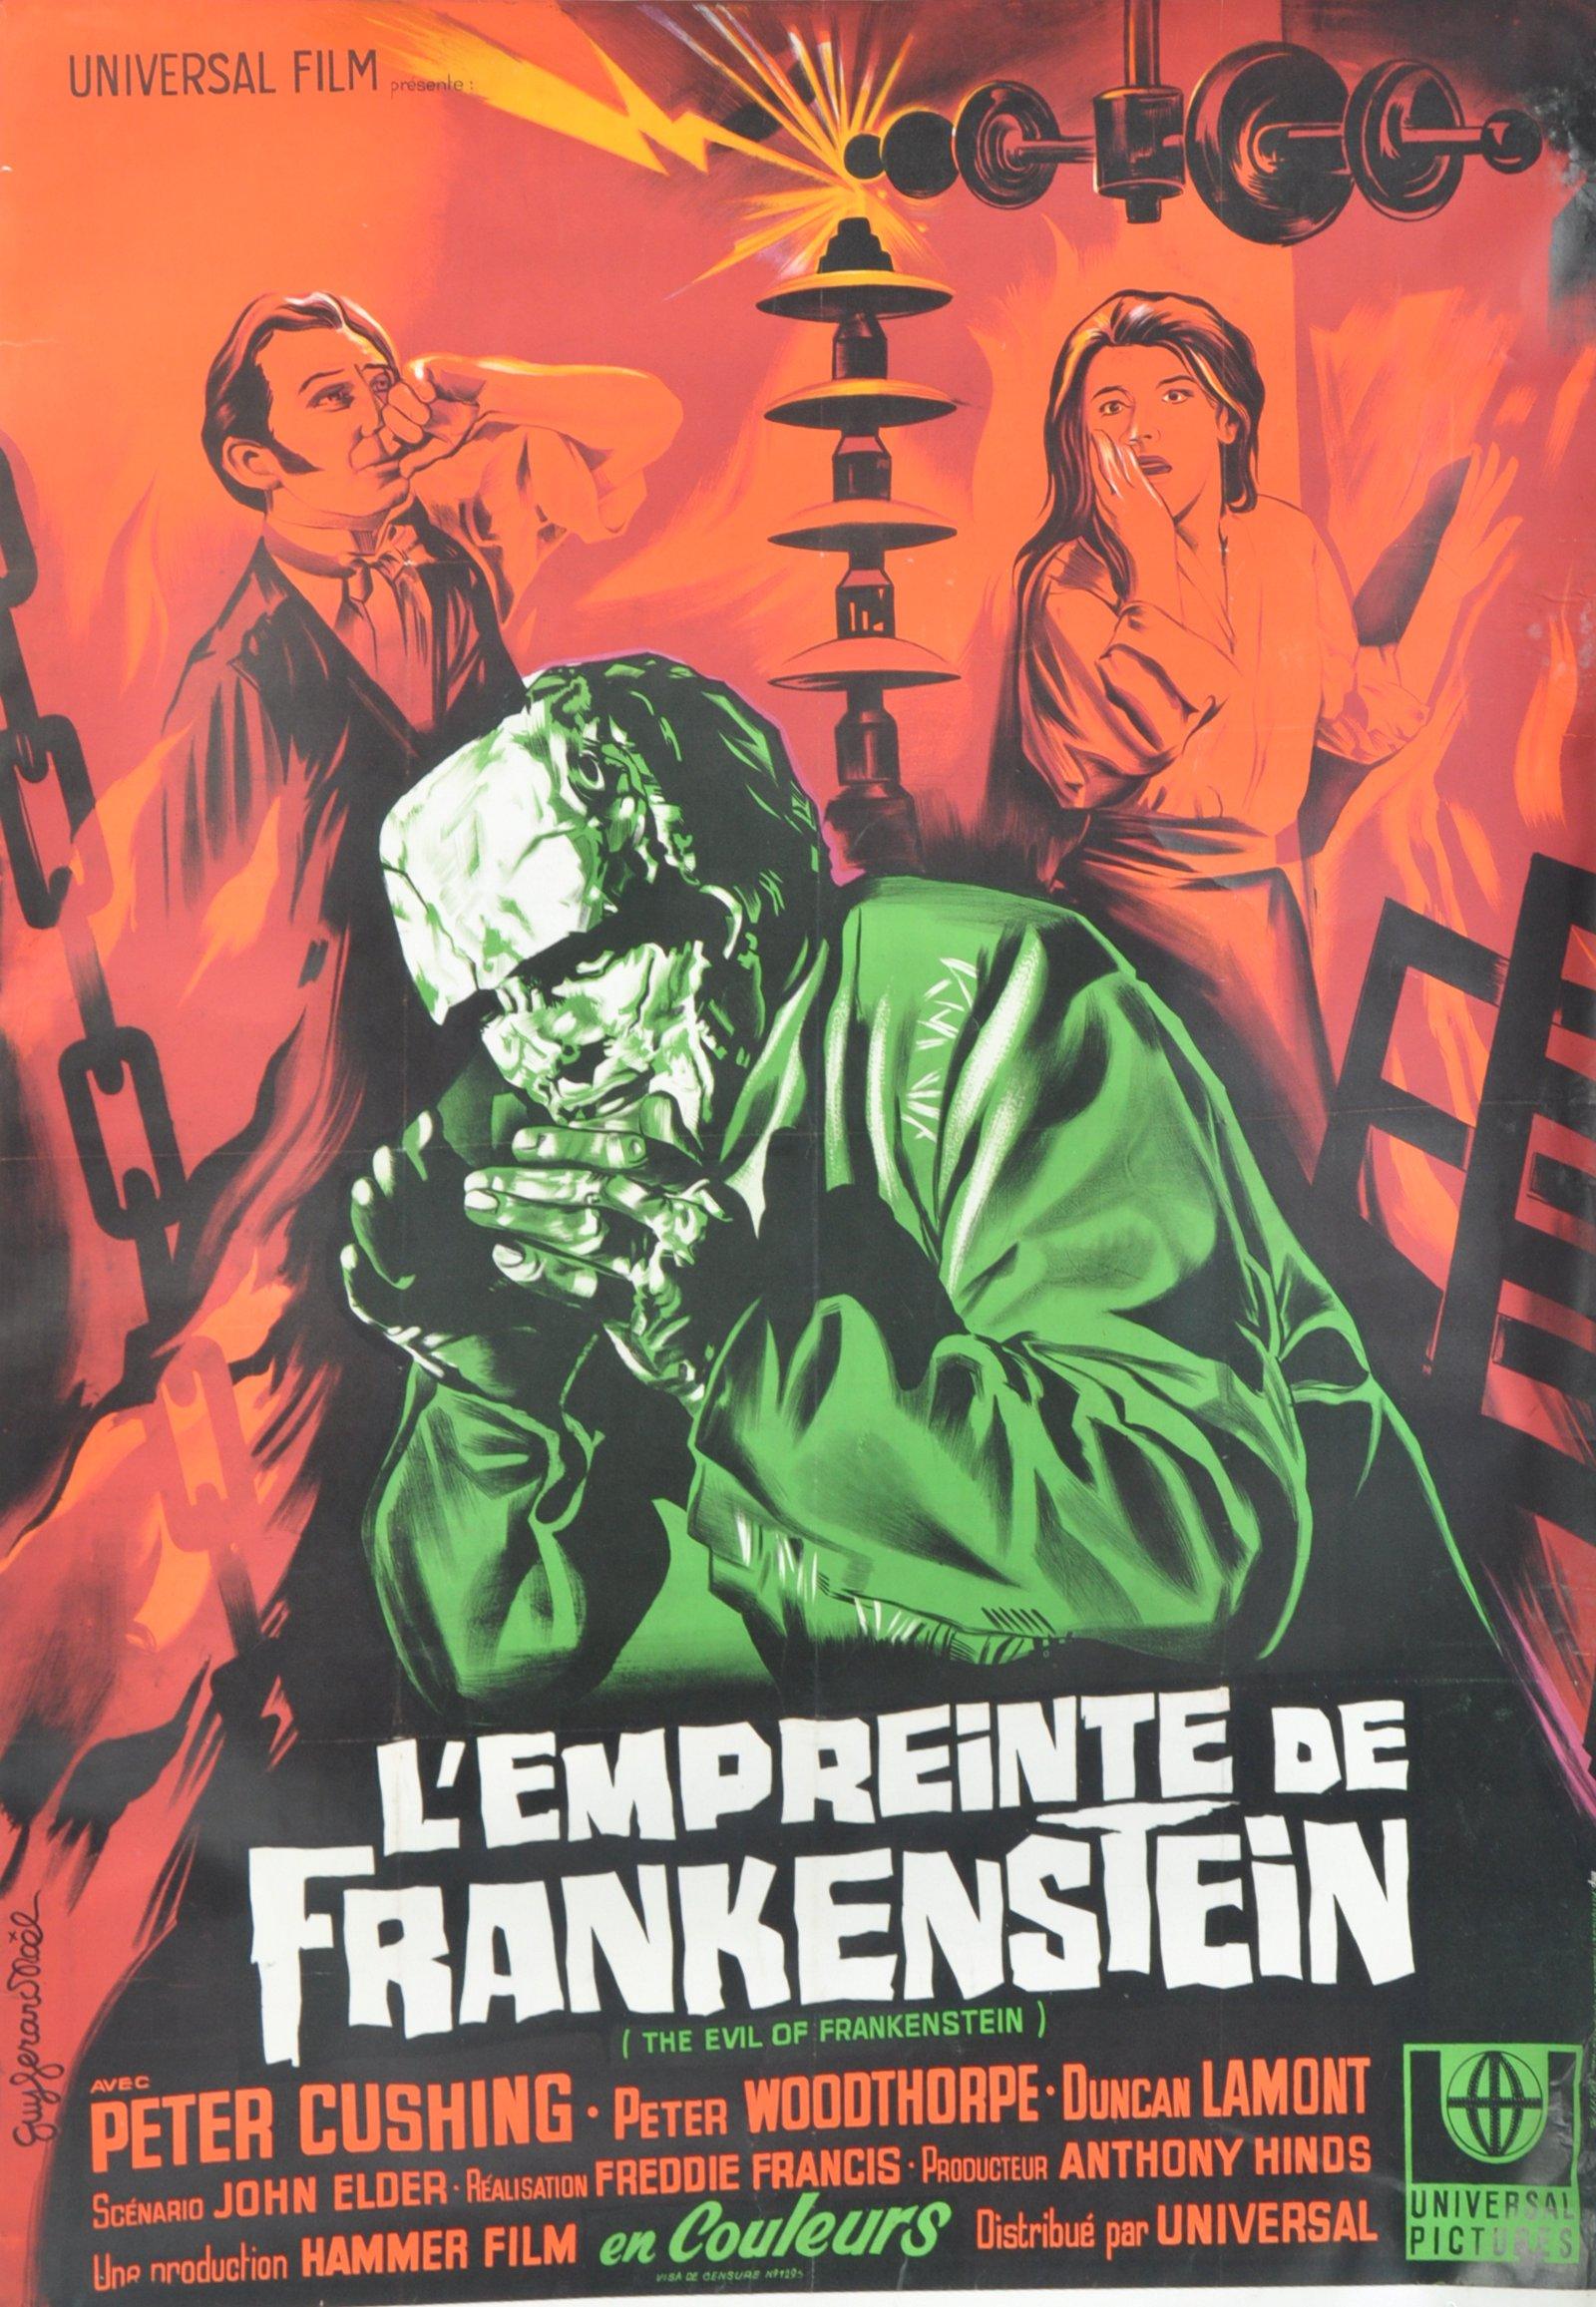 Lot 11 - 1960'S EVIL OF FRANKENSTEIN FRENCH MOVIE POSTER